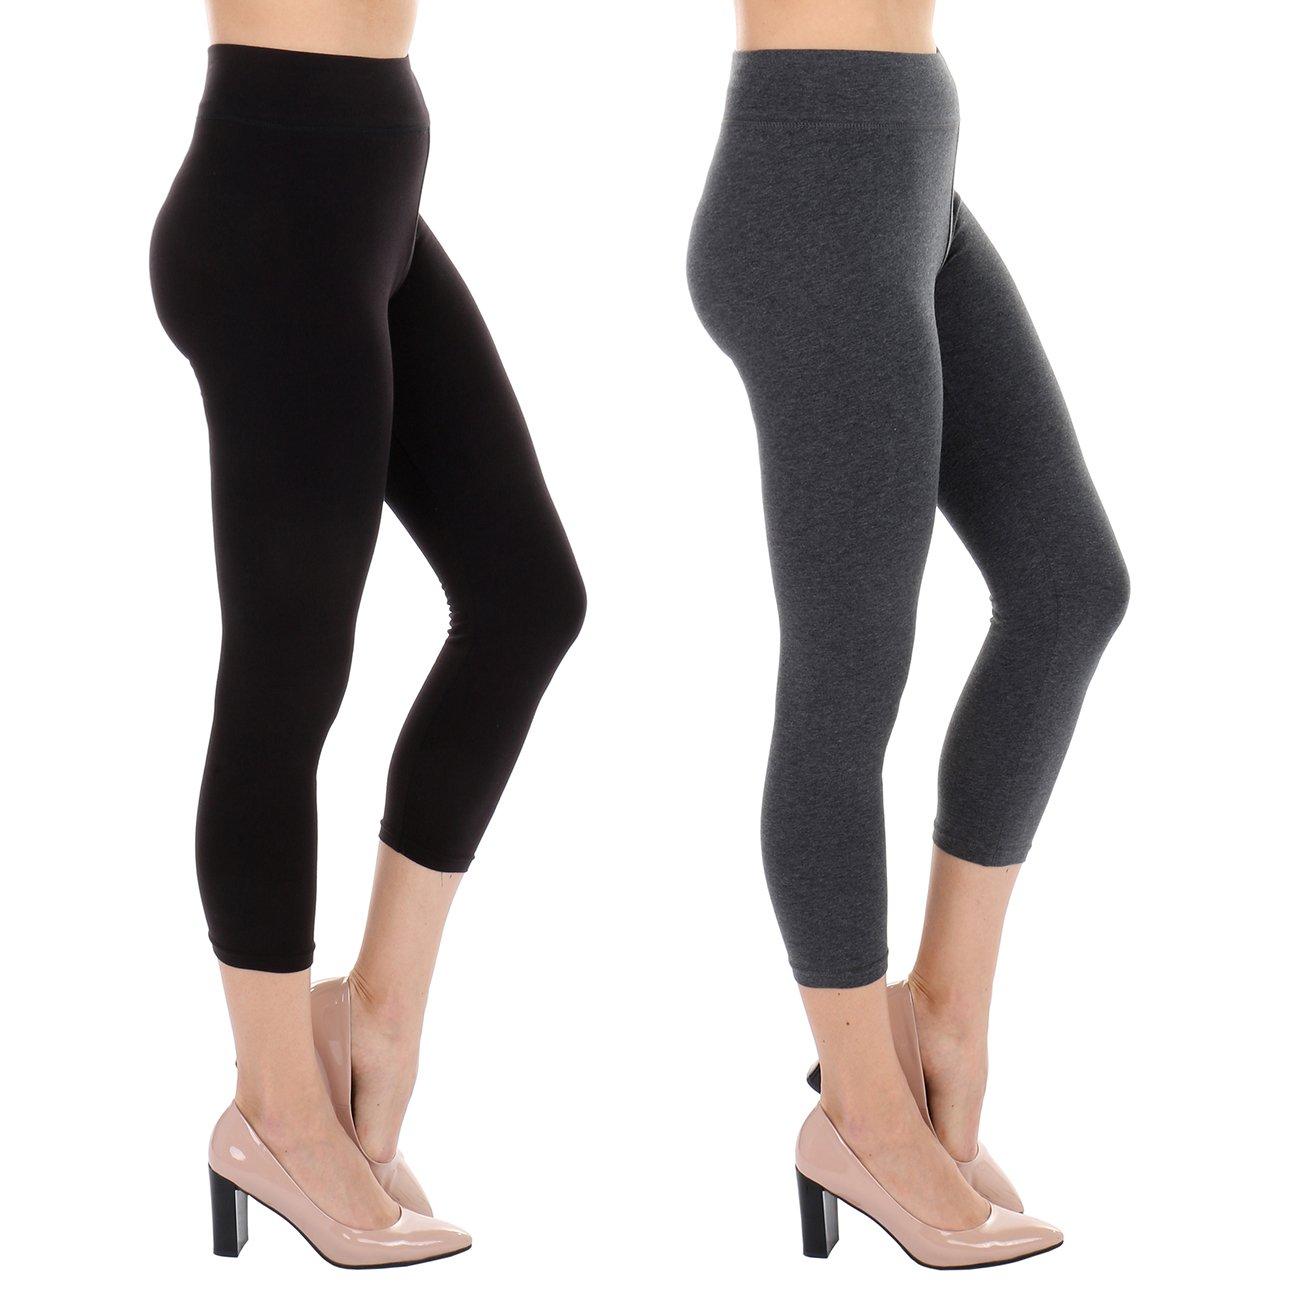 TODAY SHOWROOM Cotton Capri- Non See Thru Fabric-Yoga Waist Cropped Leggings (2pk (Black/Charcoal), Large)